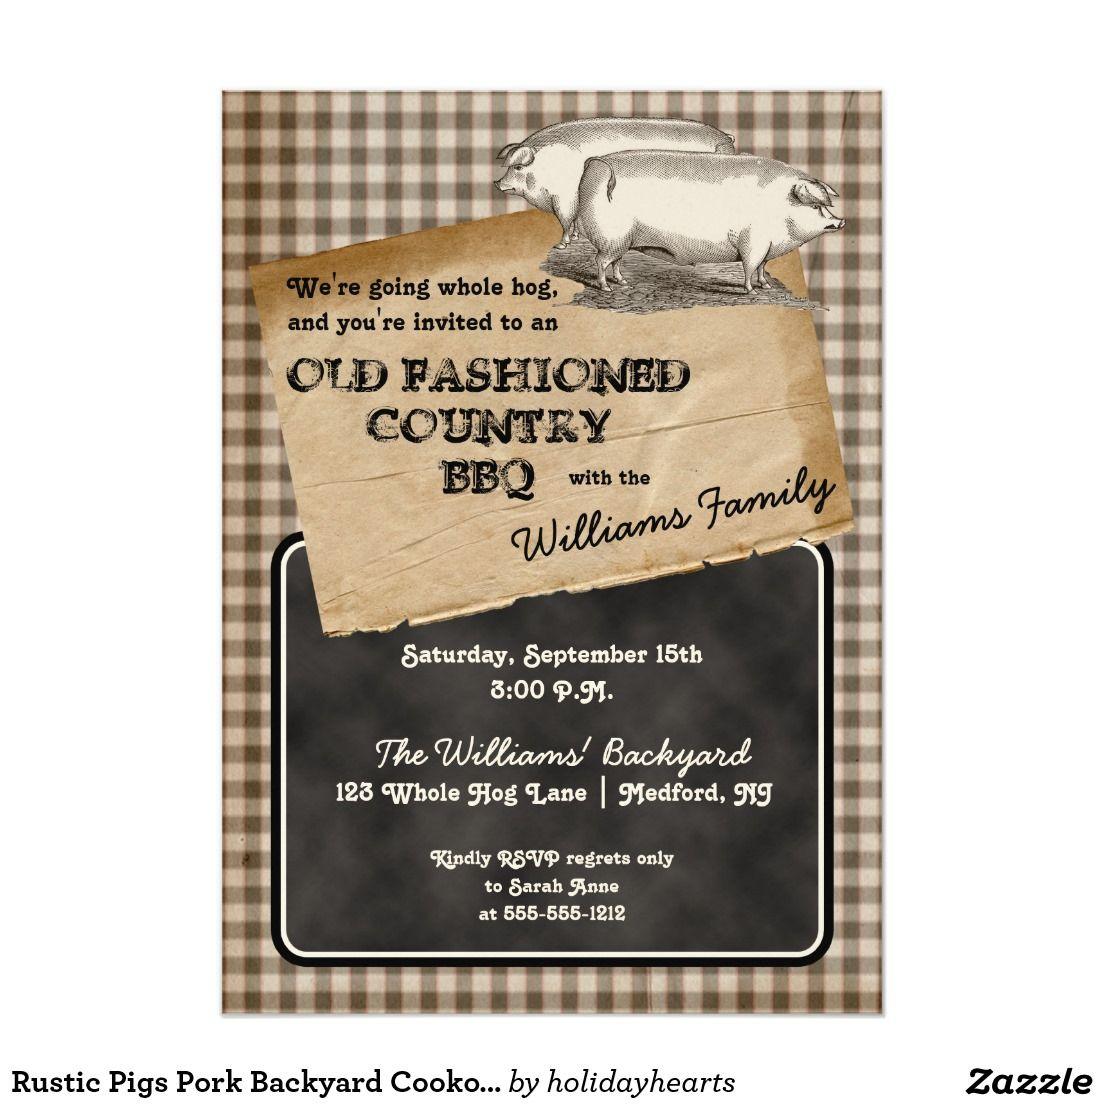 rustic pigs pork backyard cookout bbq picnic card pigs